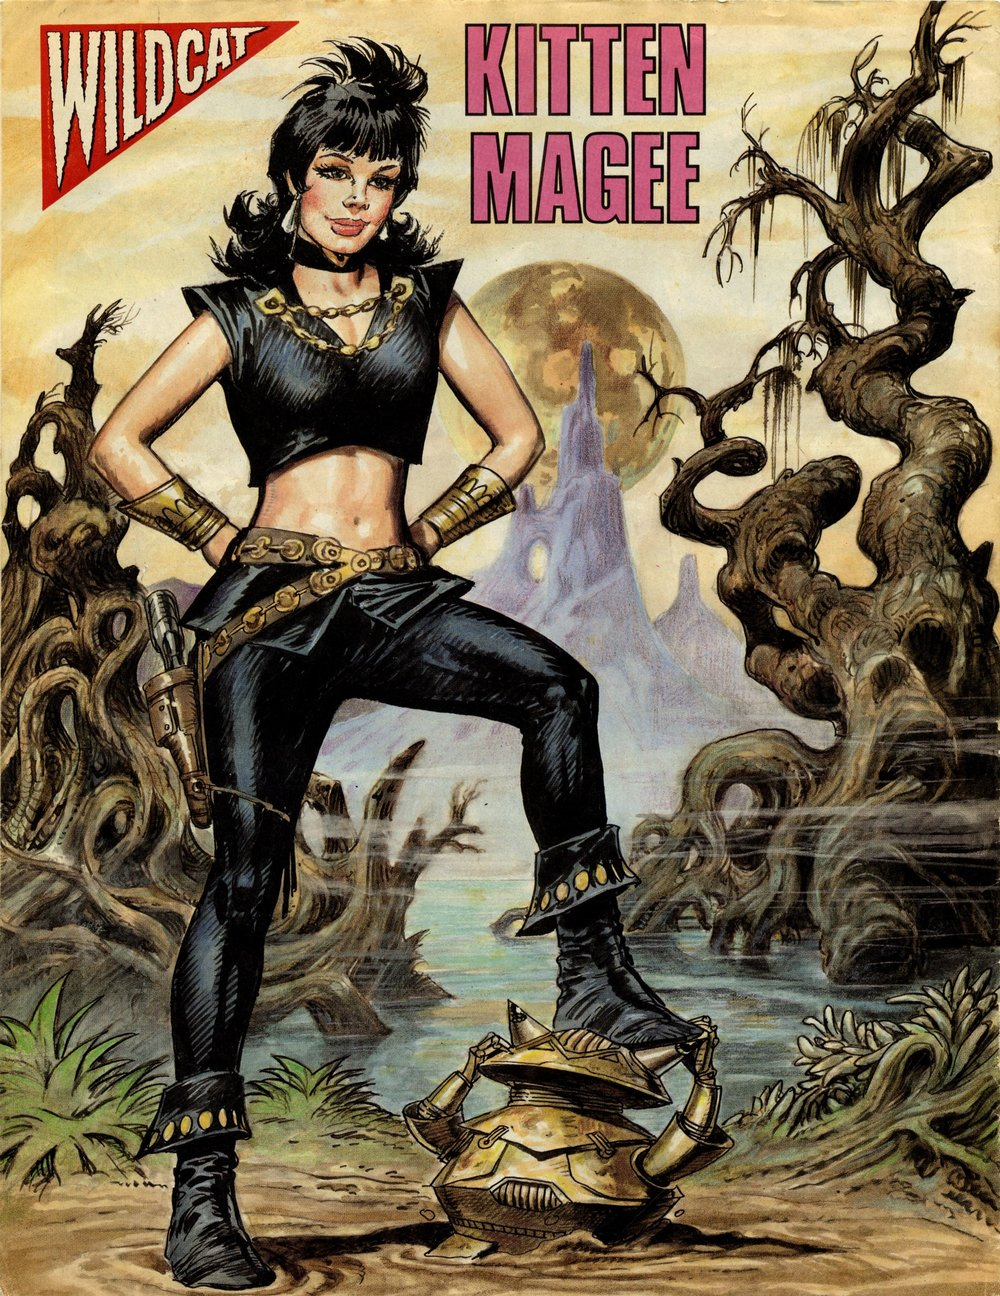 Kitten Magee poster: Jose Ortiz (artist)